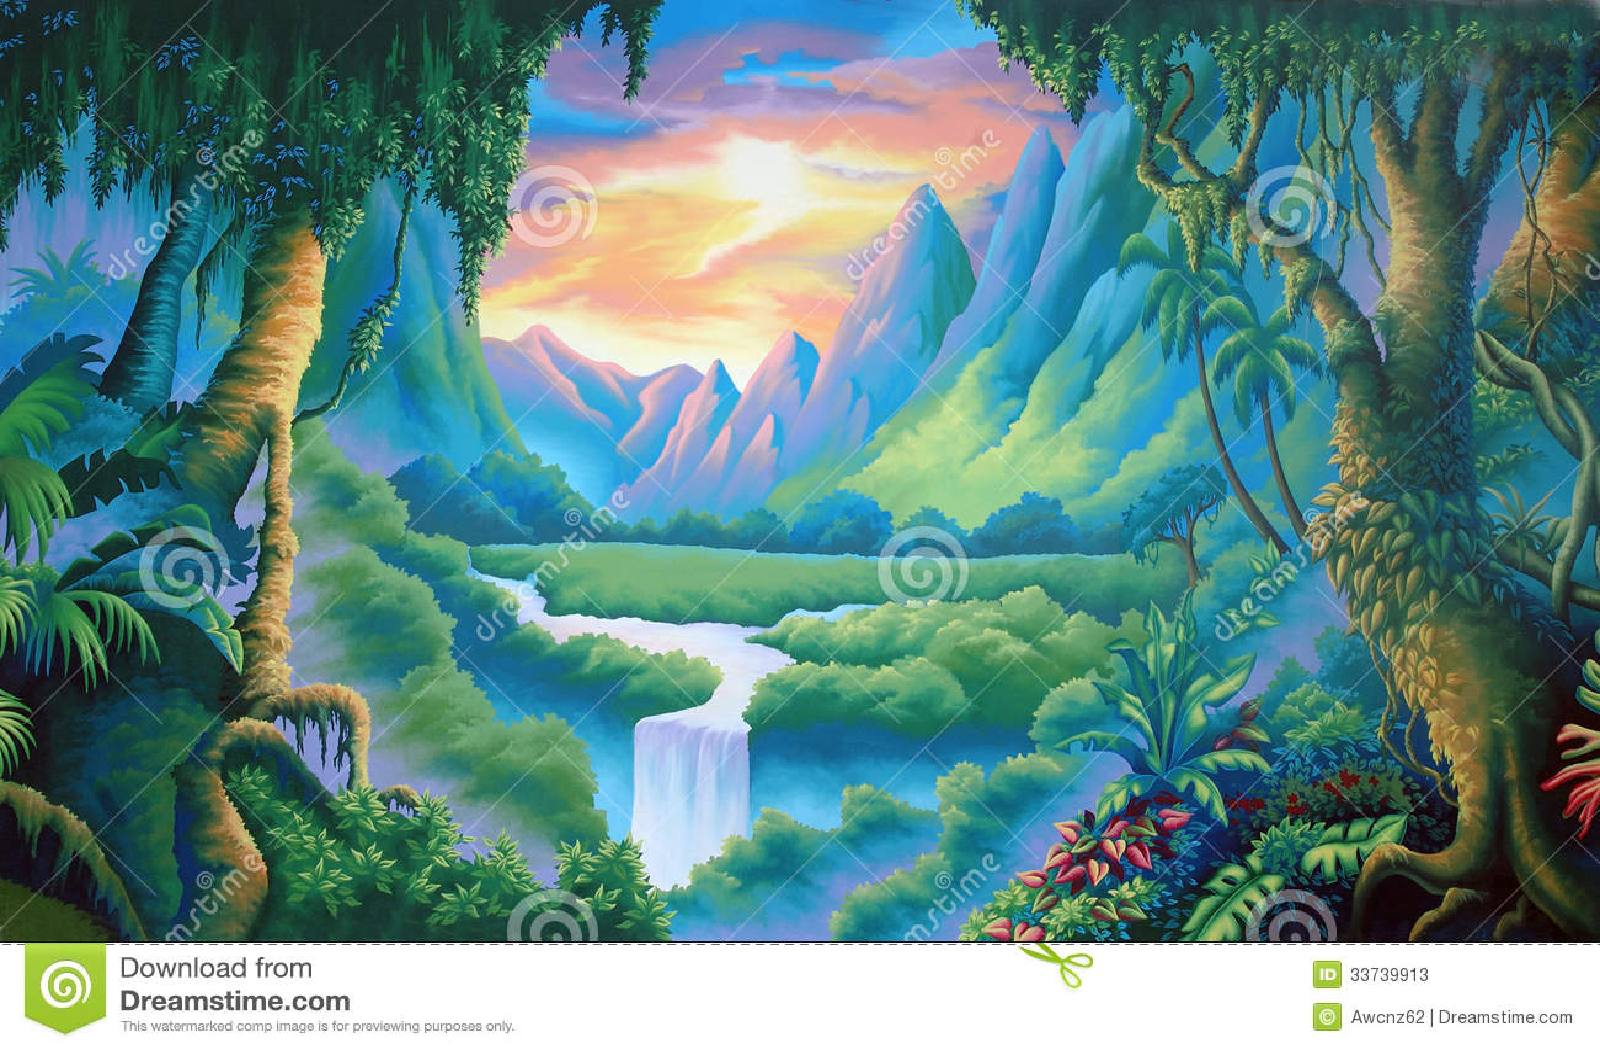 jungle backdrop stock illustration illustration of serenity 33739913